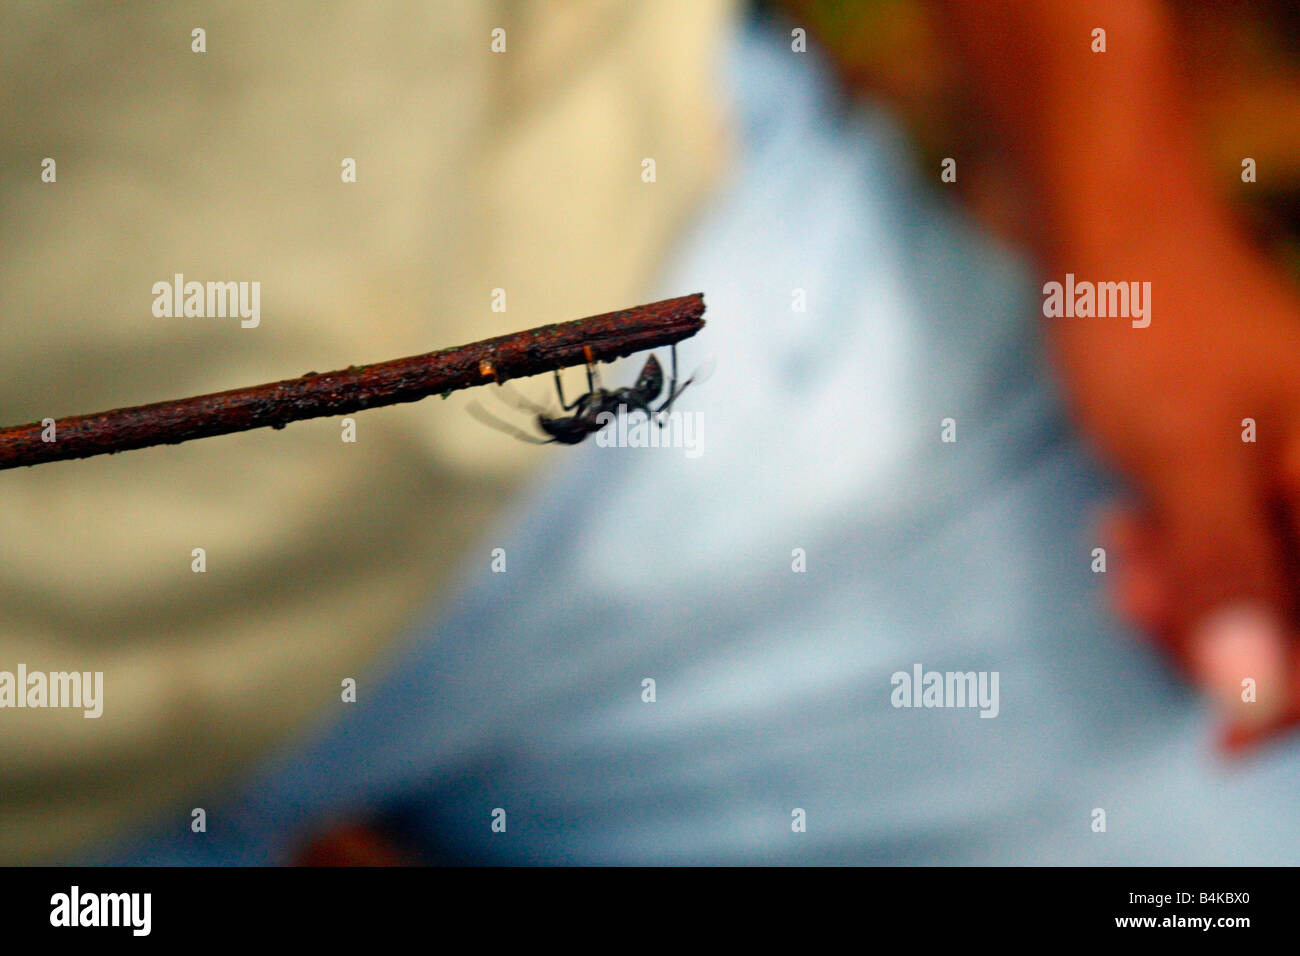 Bullet ant, Amazon Basin rainforest, Oriente, Ecuador Stock Photo